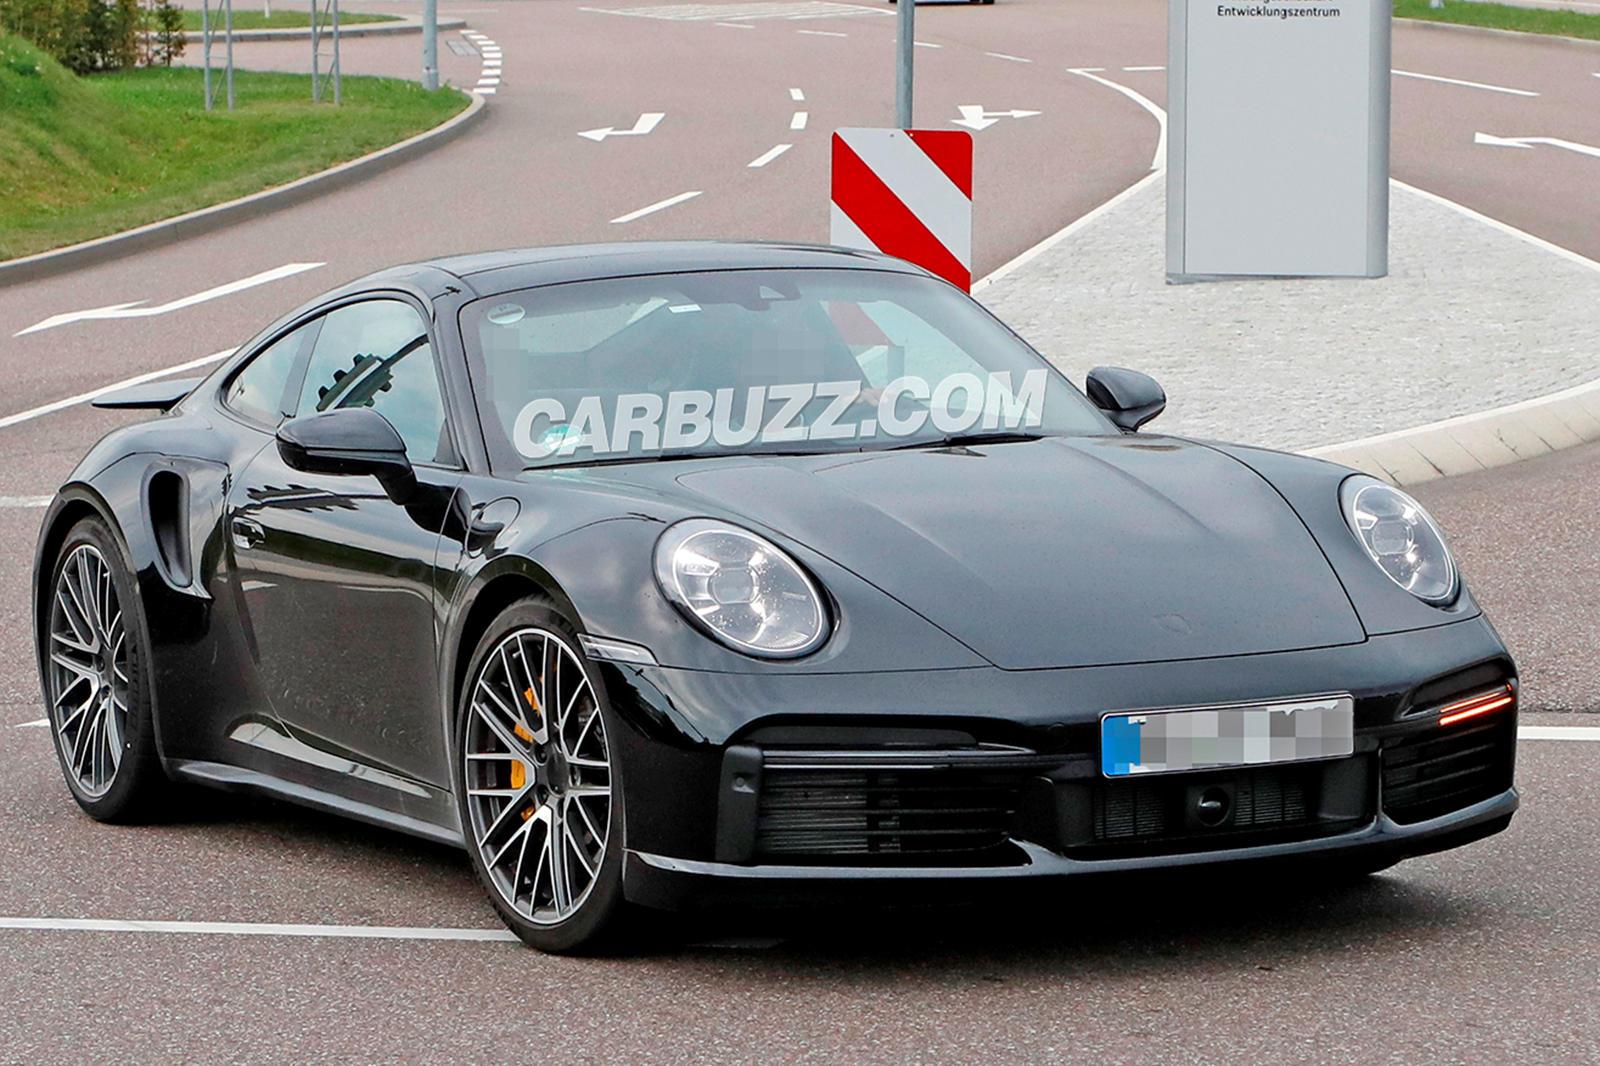 New Porsche 911 Turbo Caught Practically Naked